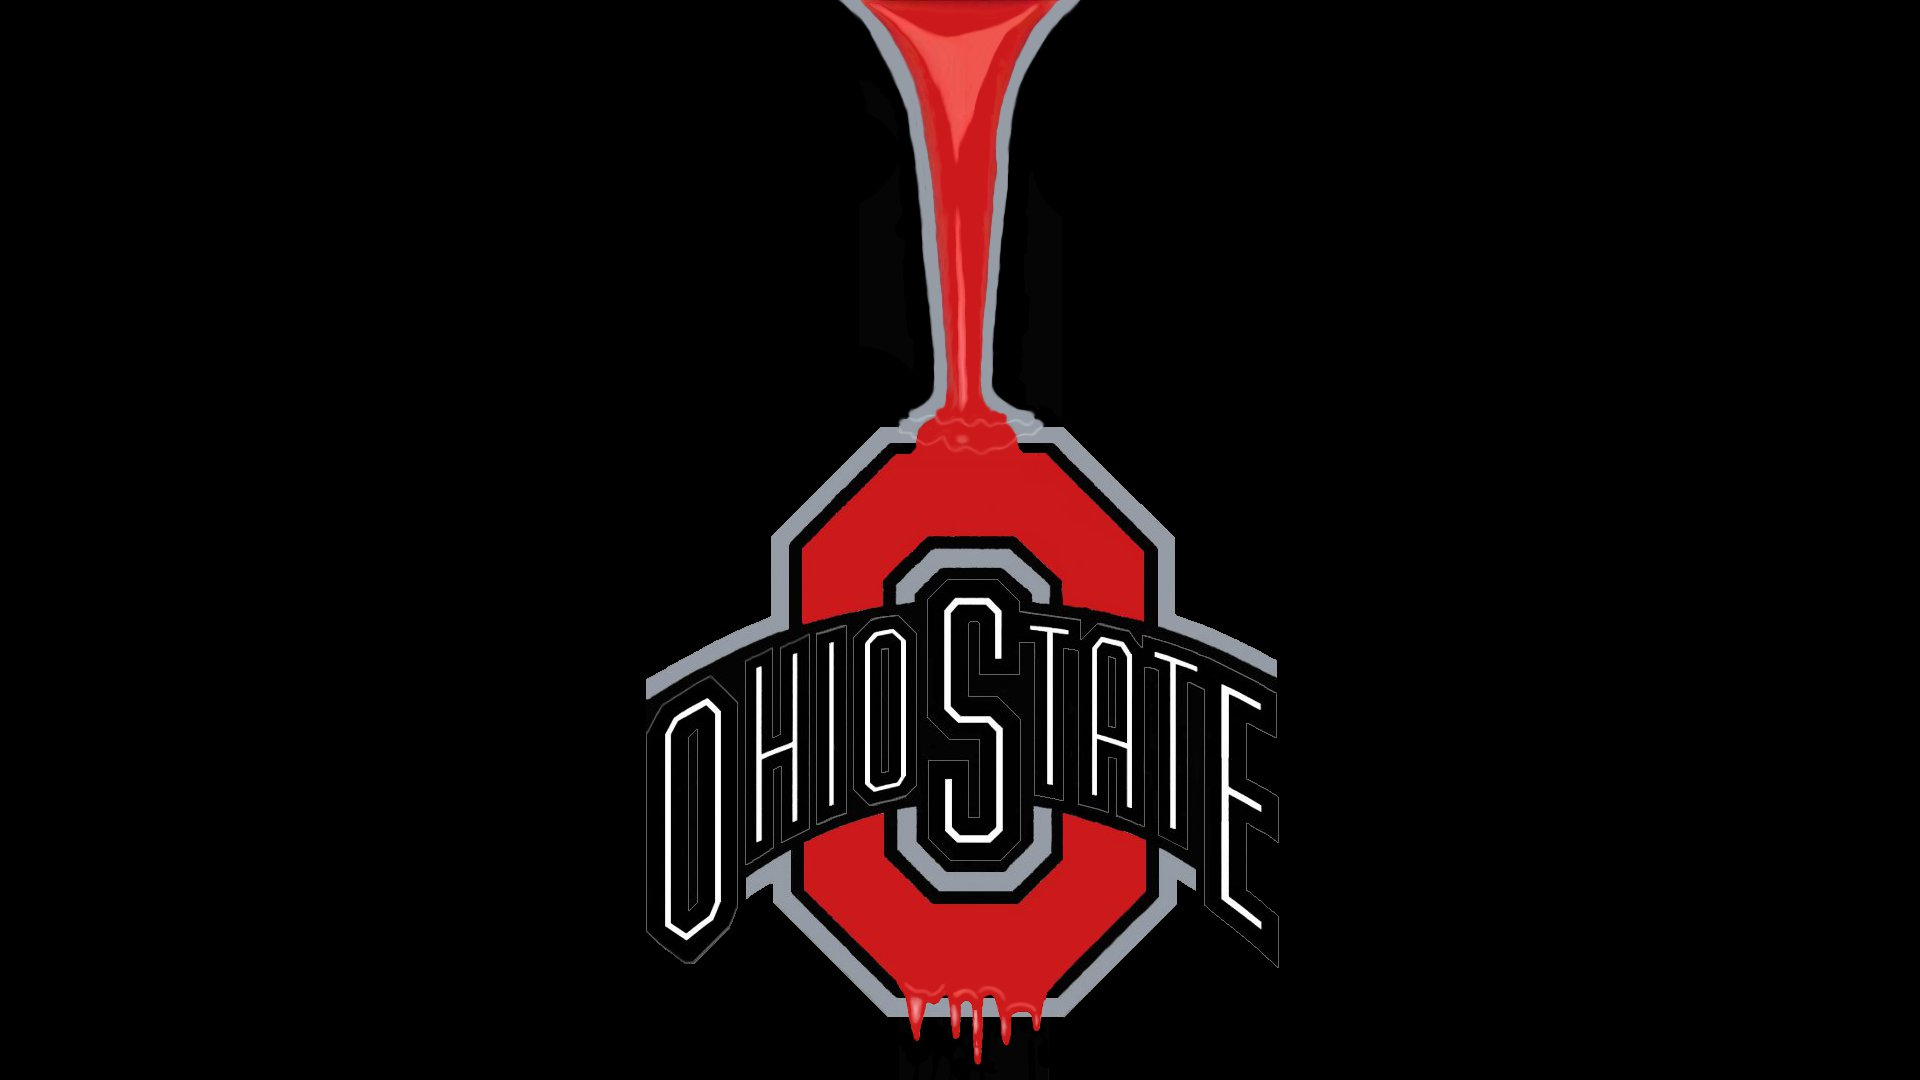 OSU Wallpaper 202 - Ohio State Football Wallpaper (29072199) - Fanpop